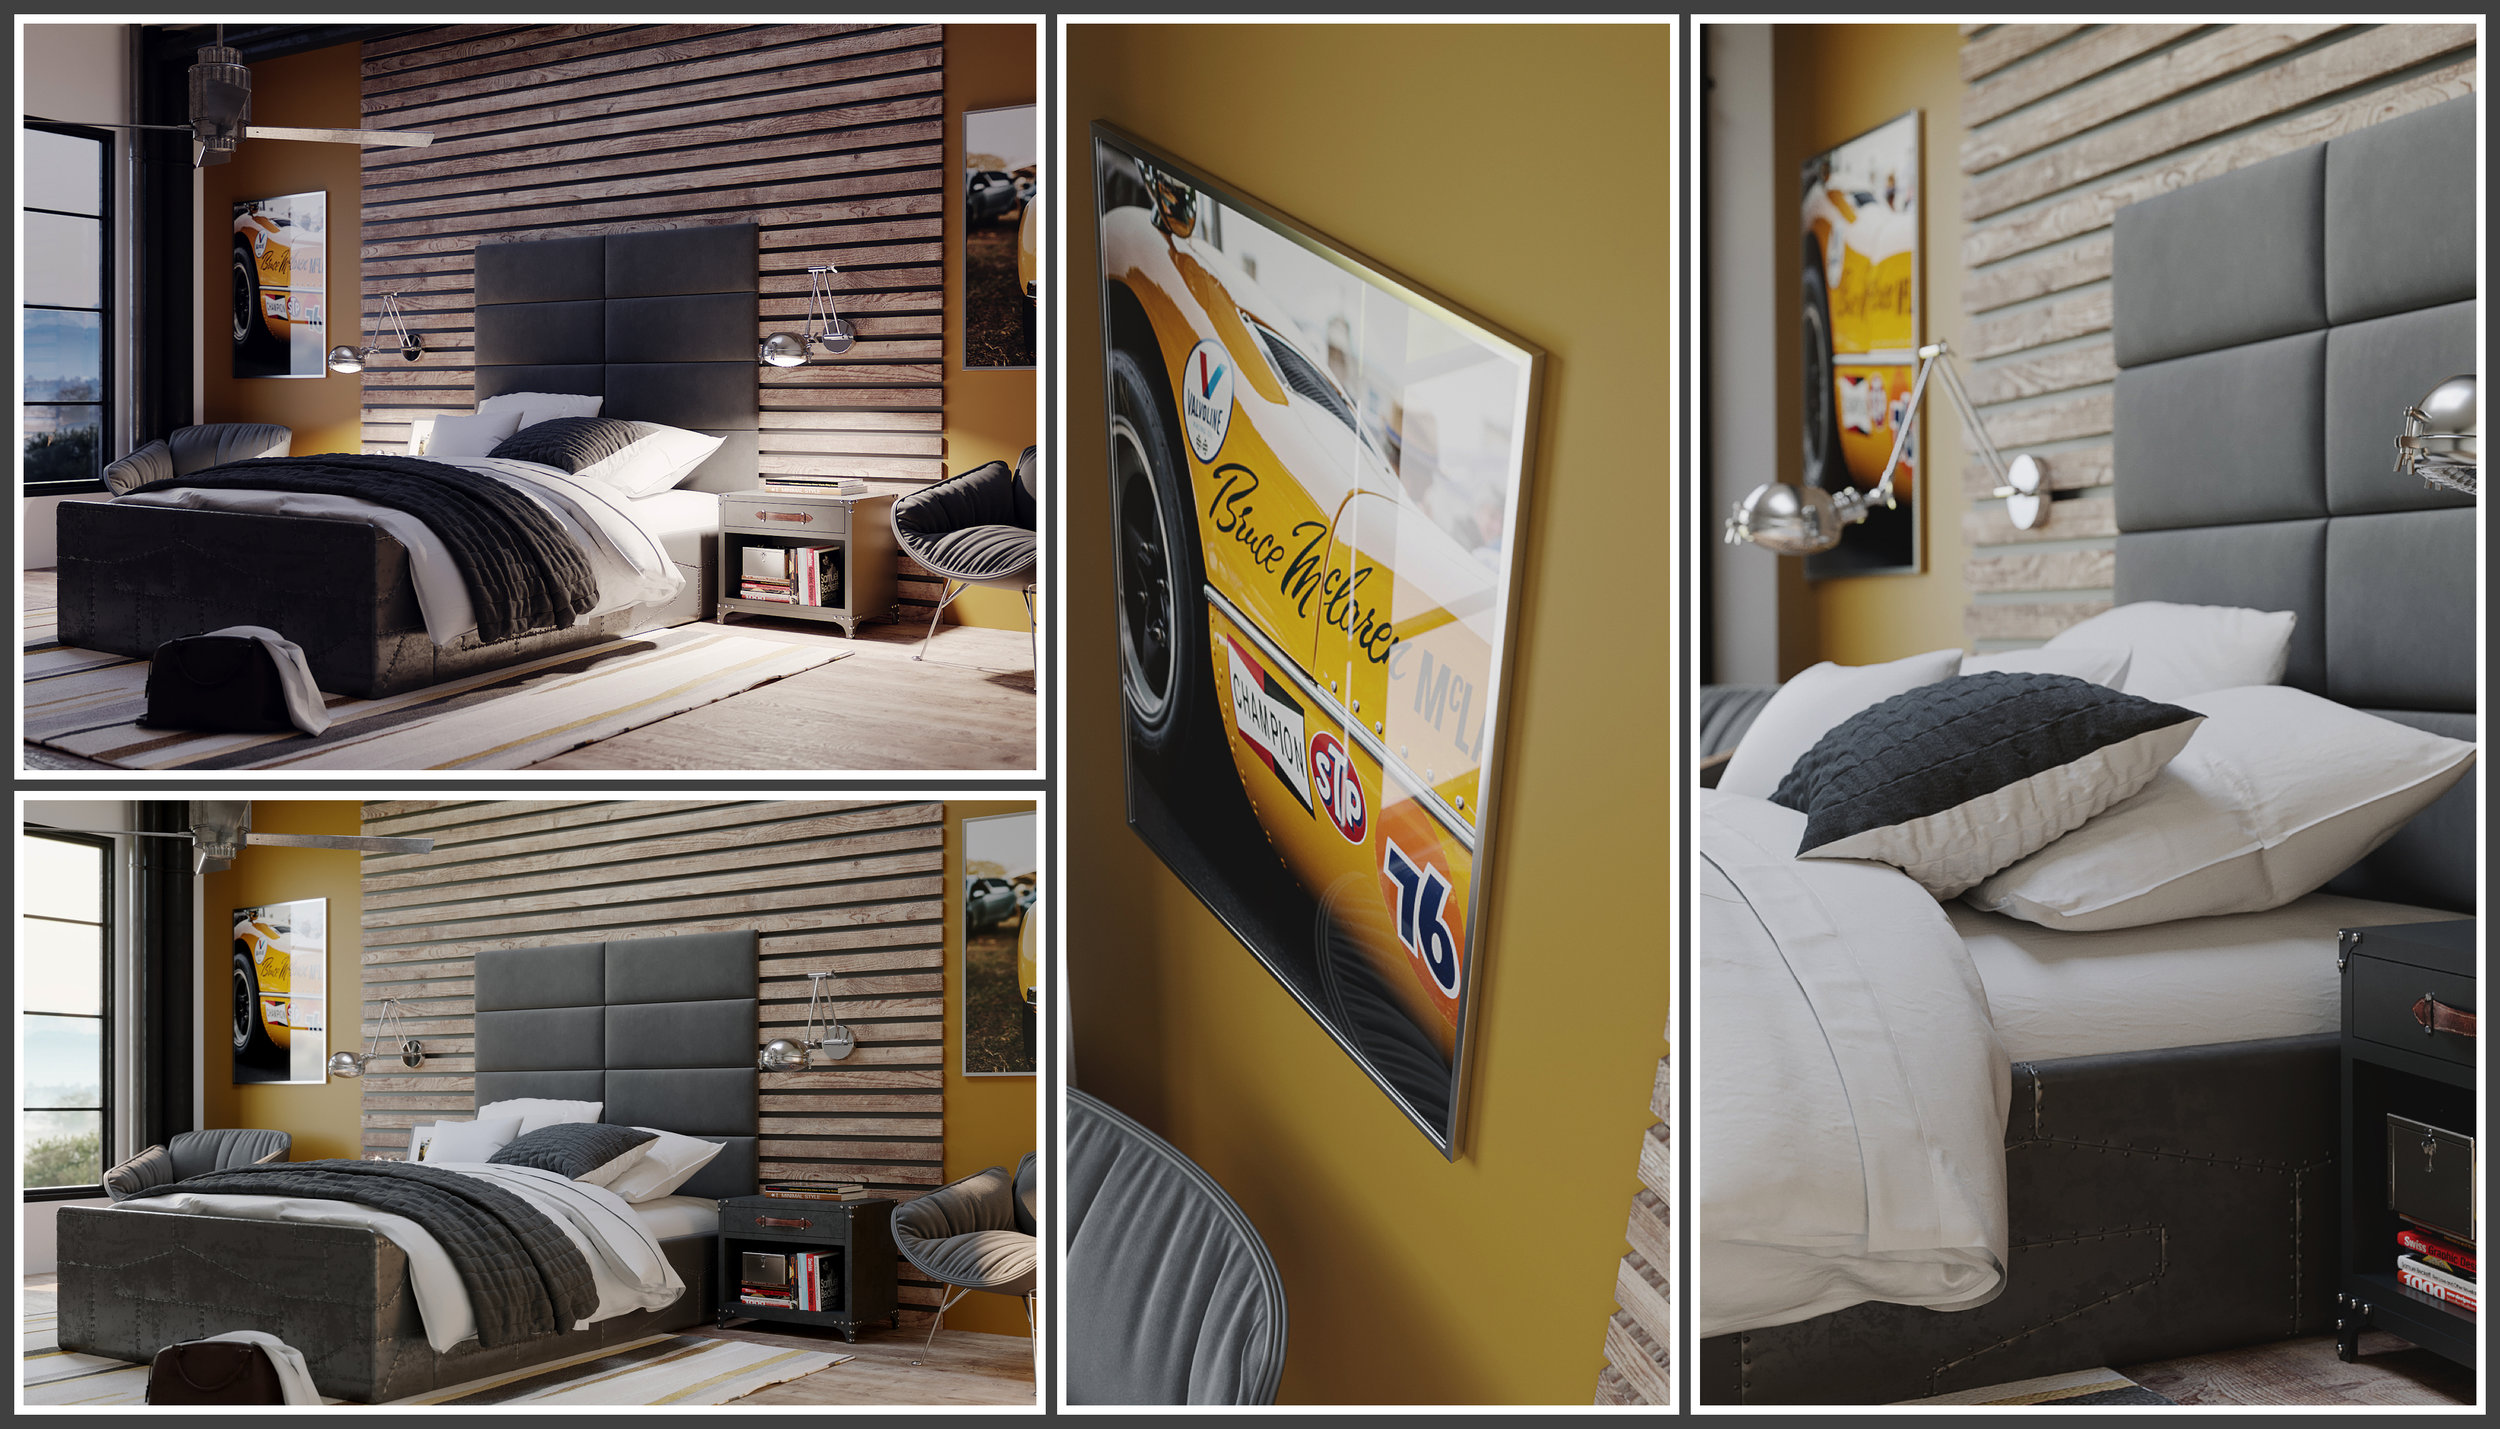 Teenage Bedroom Panels ( re-imagined )